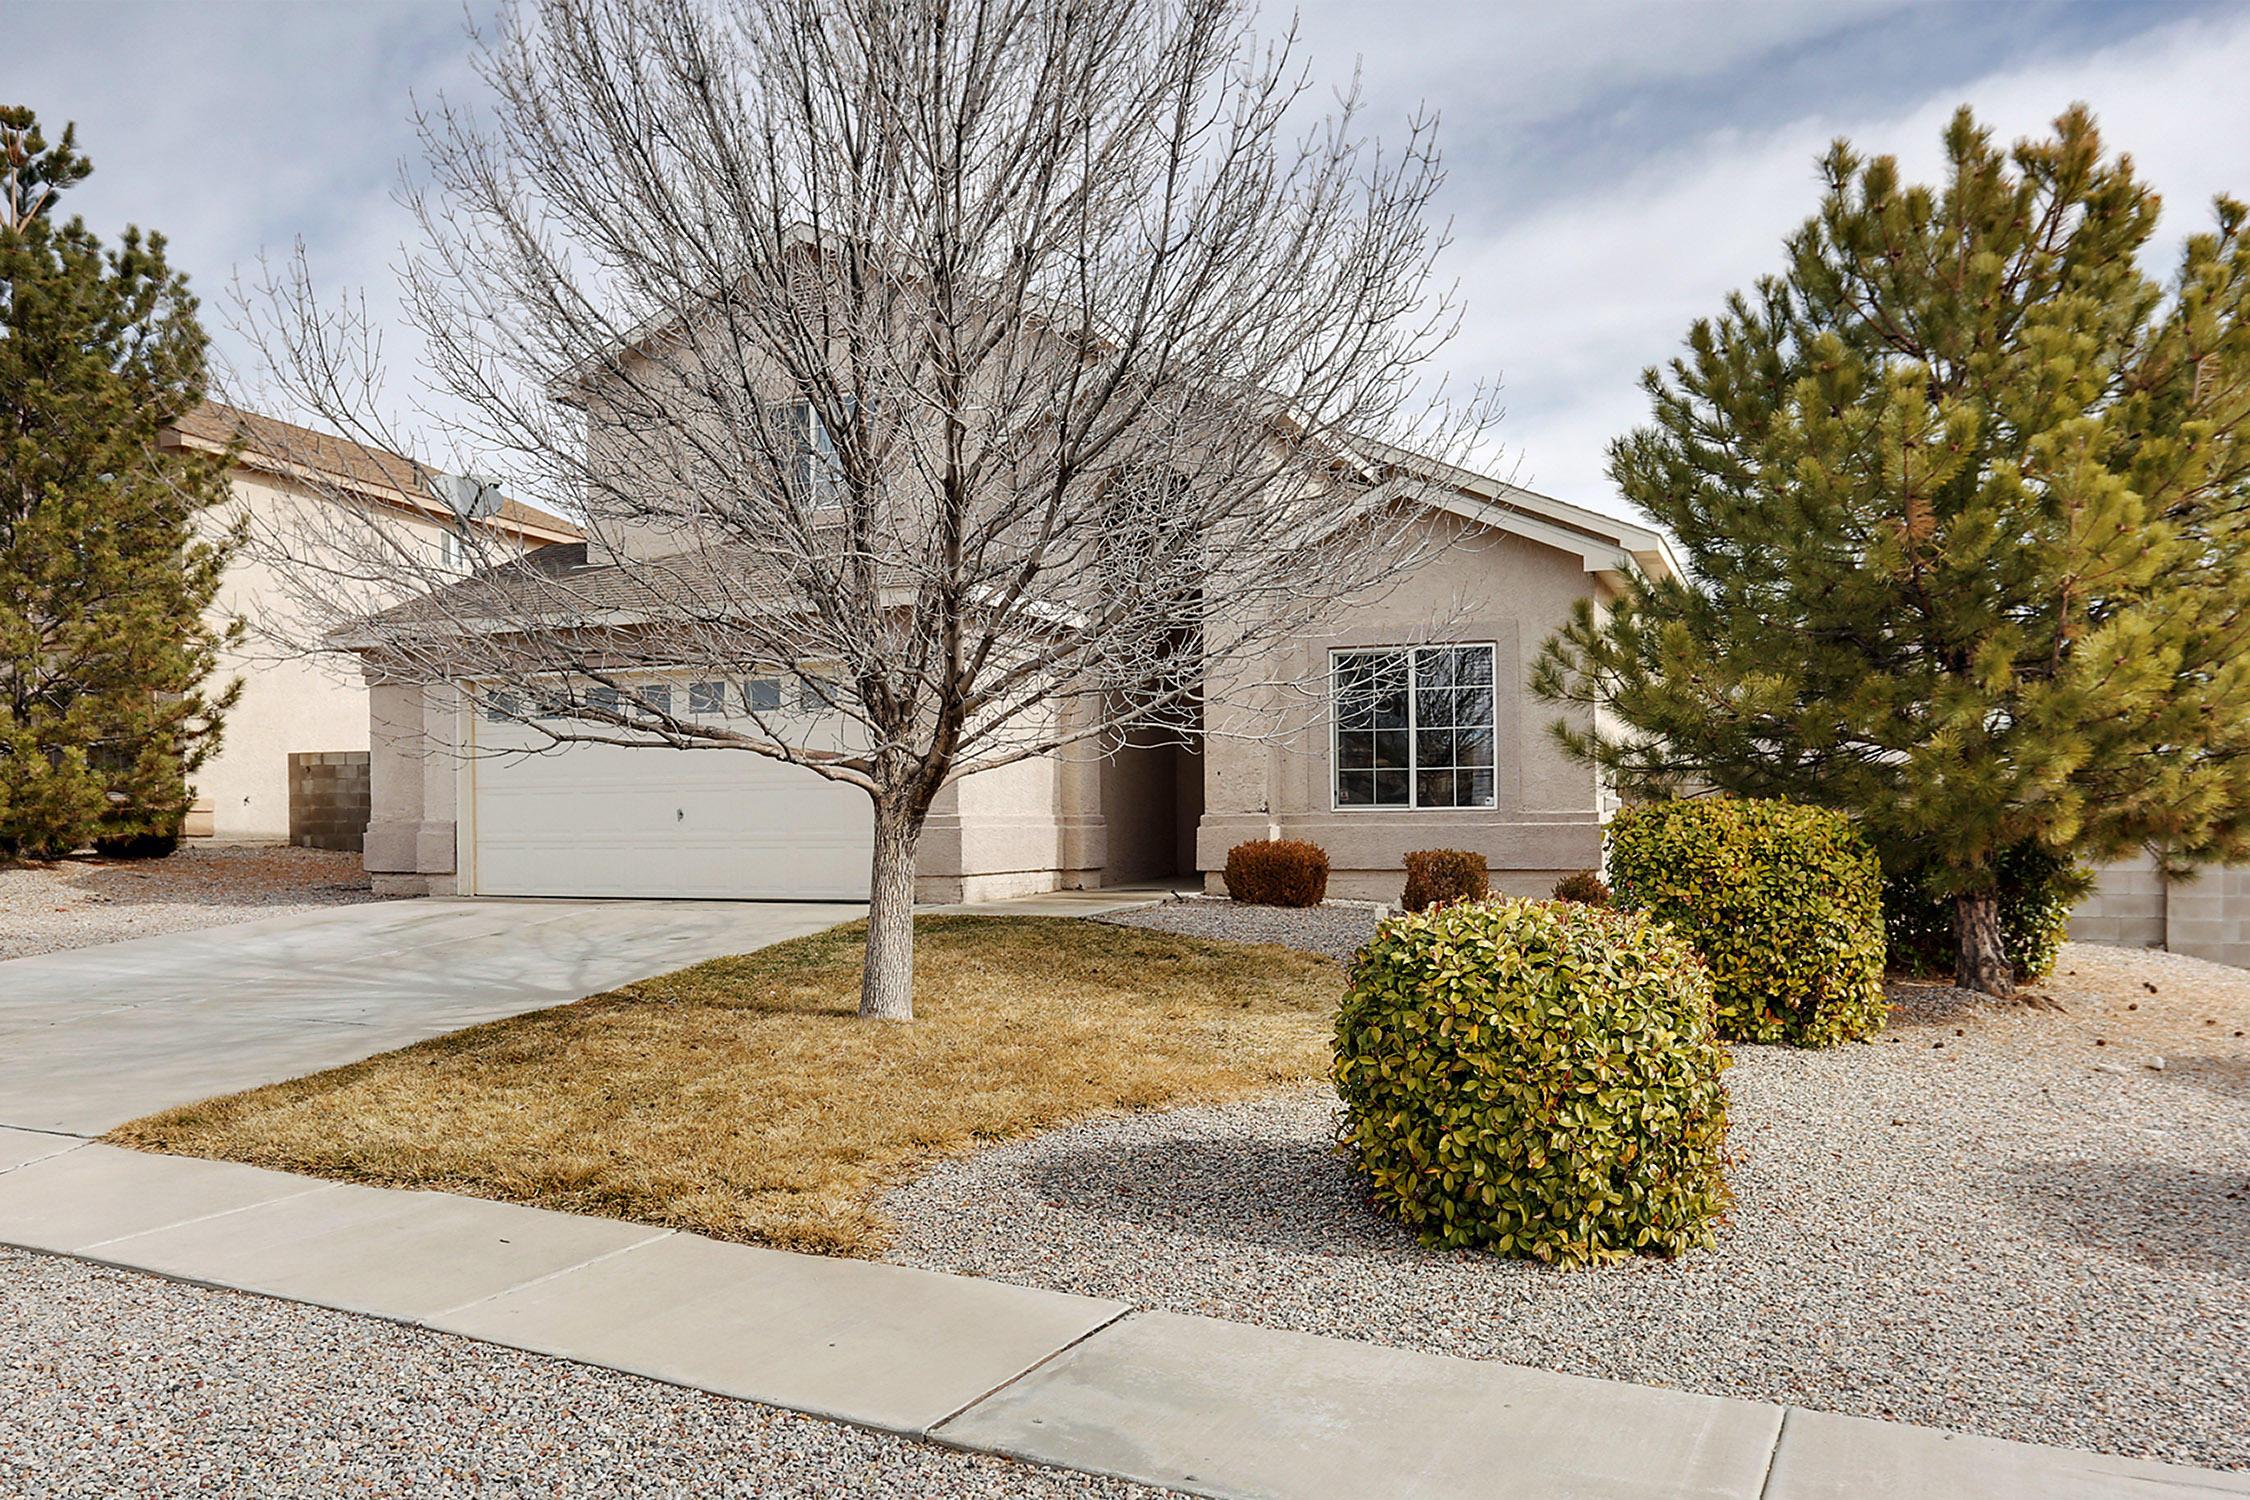 3301 NE Stony Meadows Circle, Rio Rancho in Sandoval County, NM 87144 Home for Sale